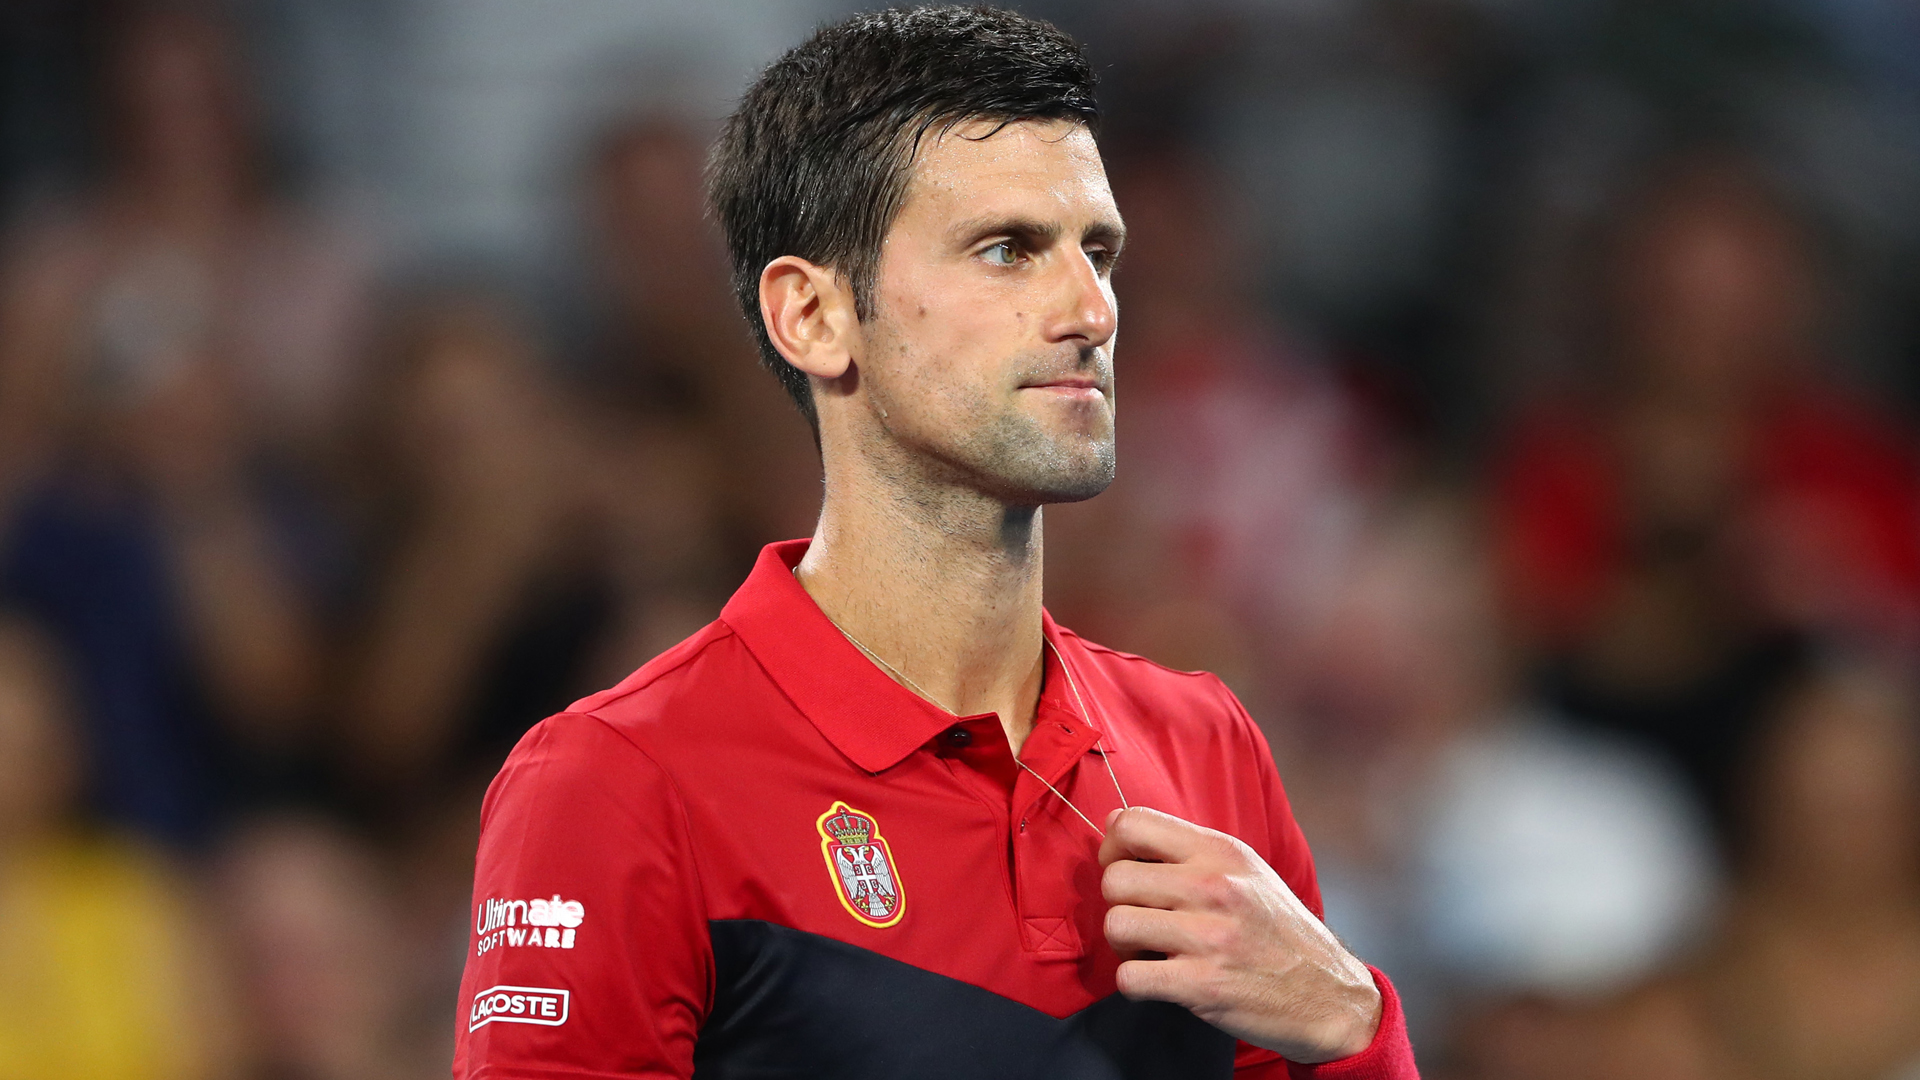 Novak Djokovic accuses critics of a 'witch hunt' following Adria Tour disaster